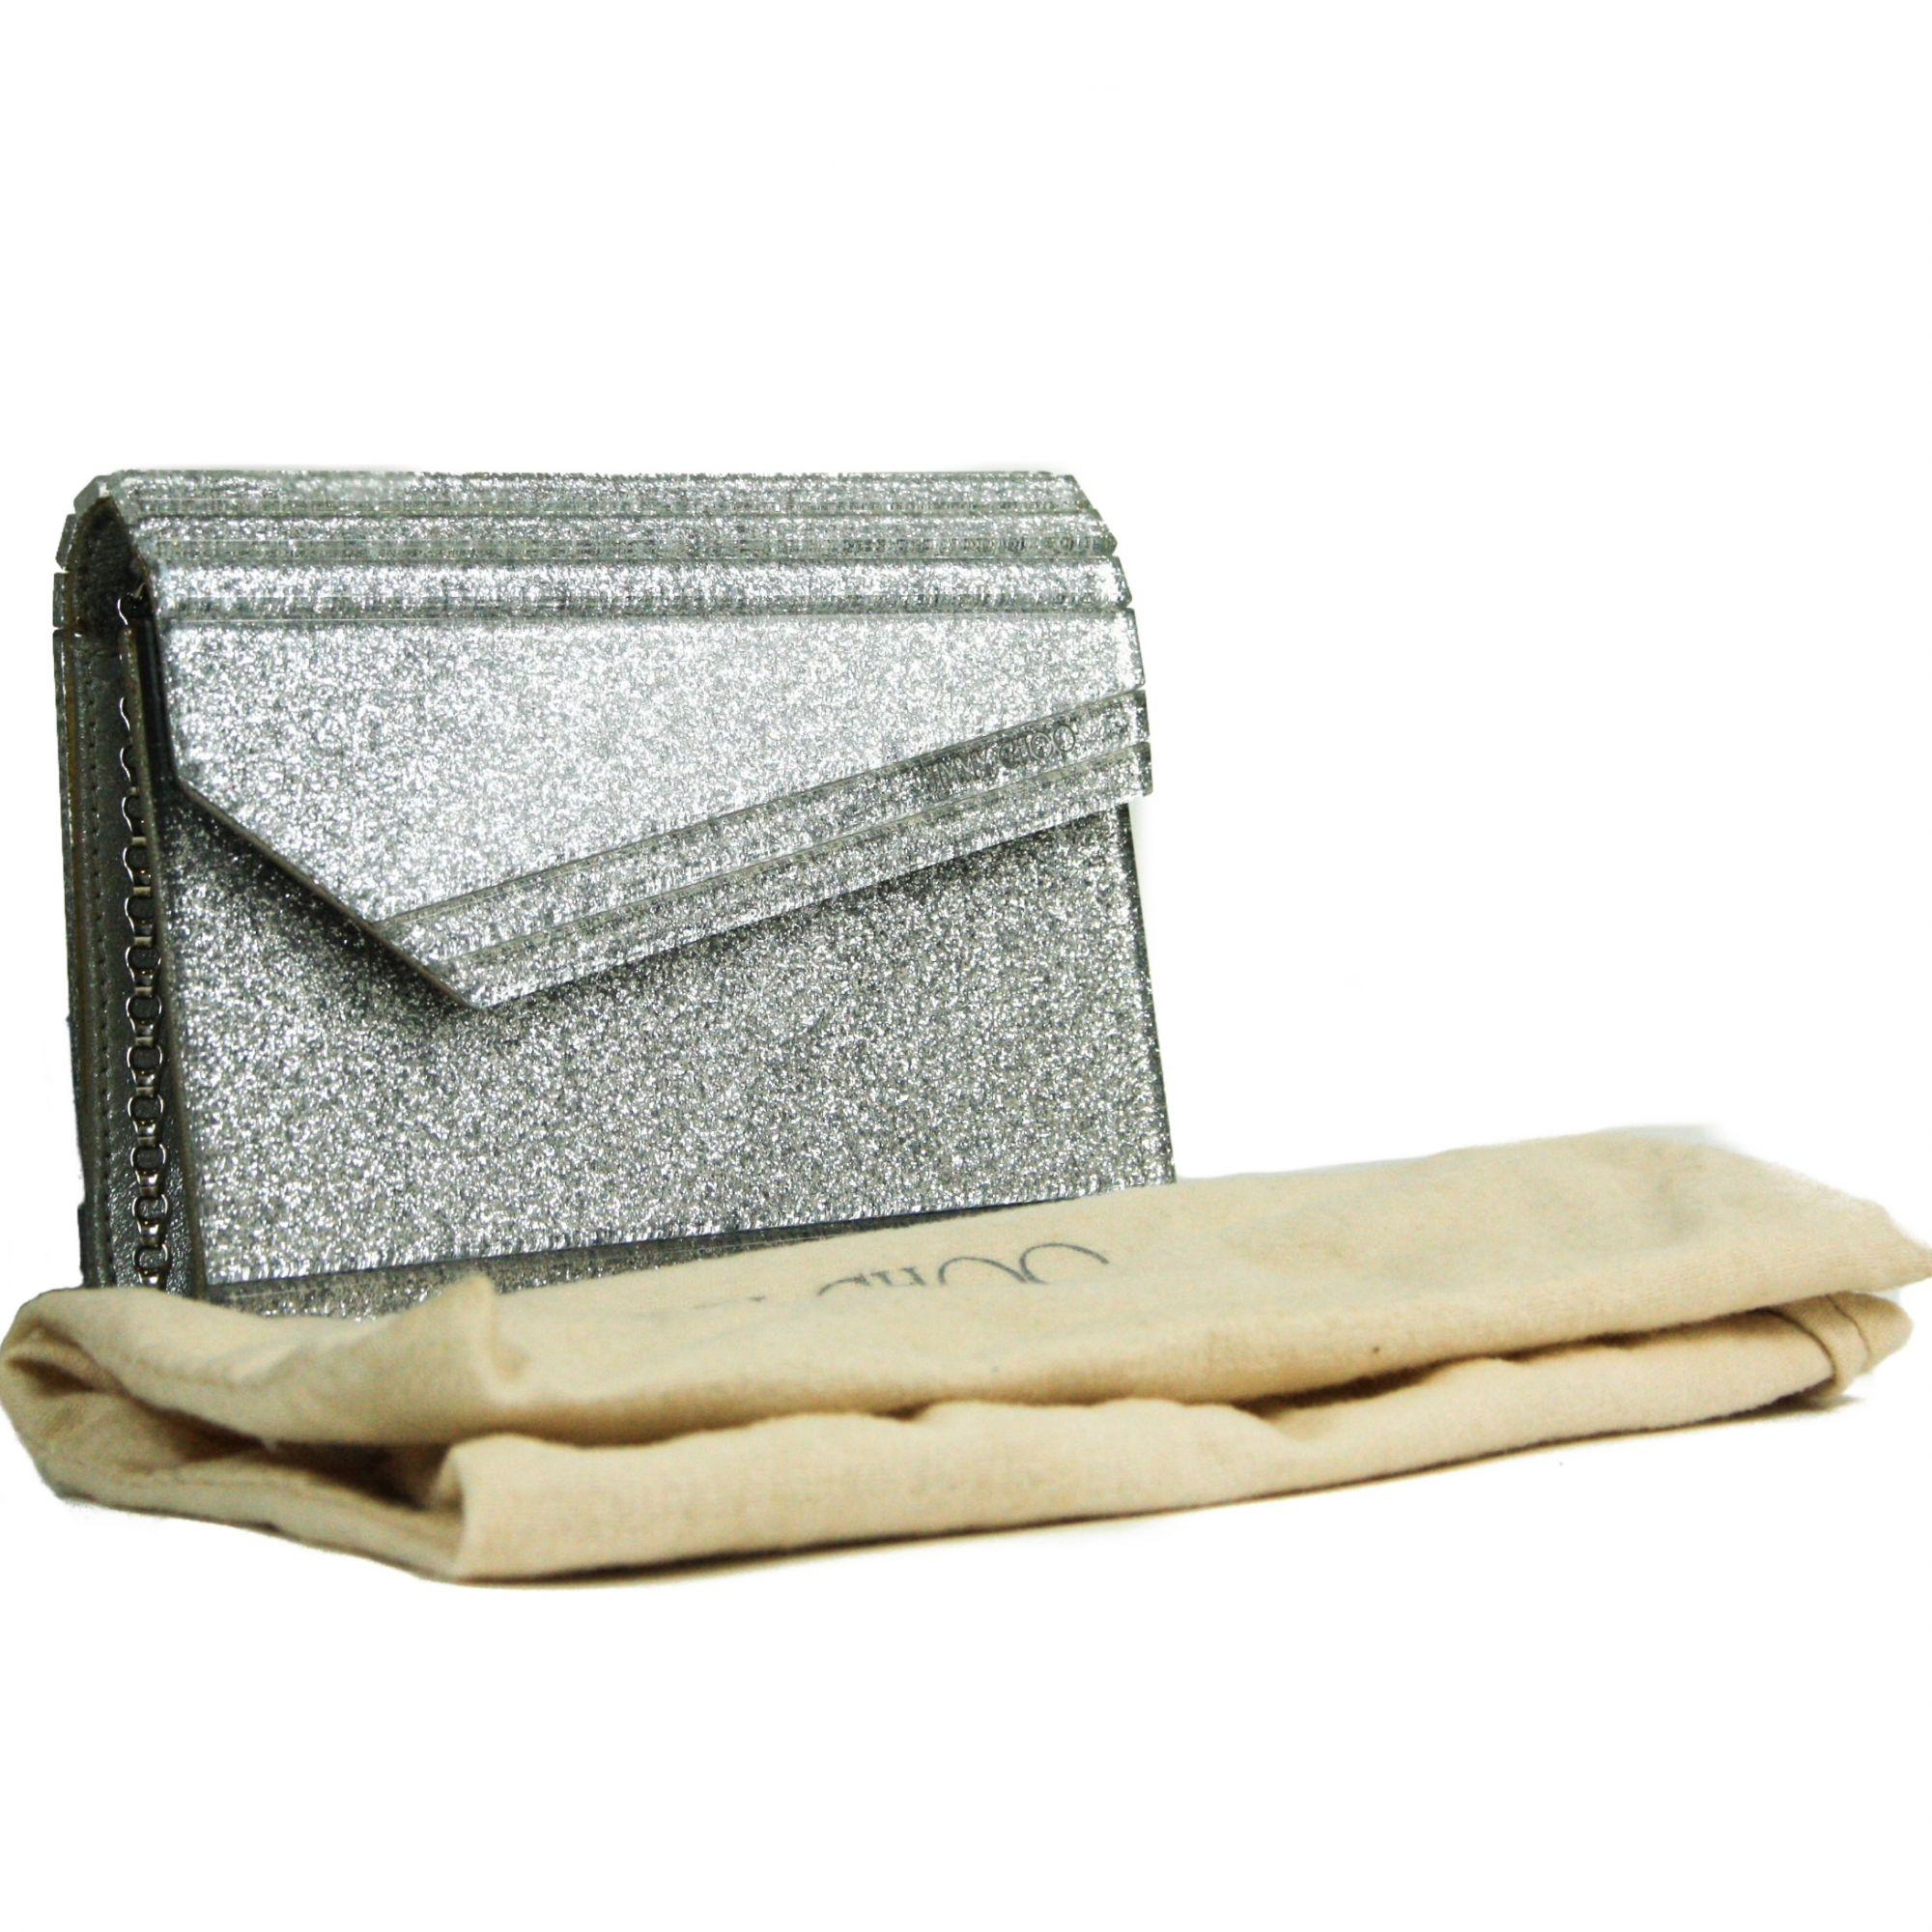 Candy Glitter-Embellished Clutch Bag